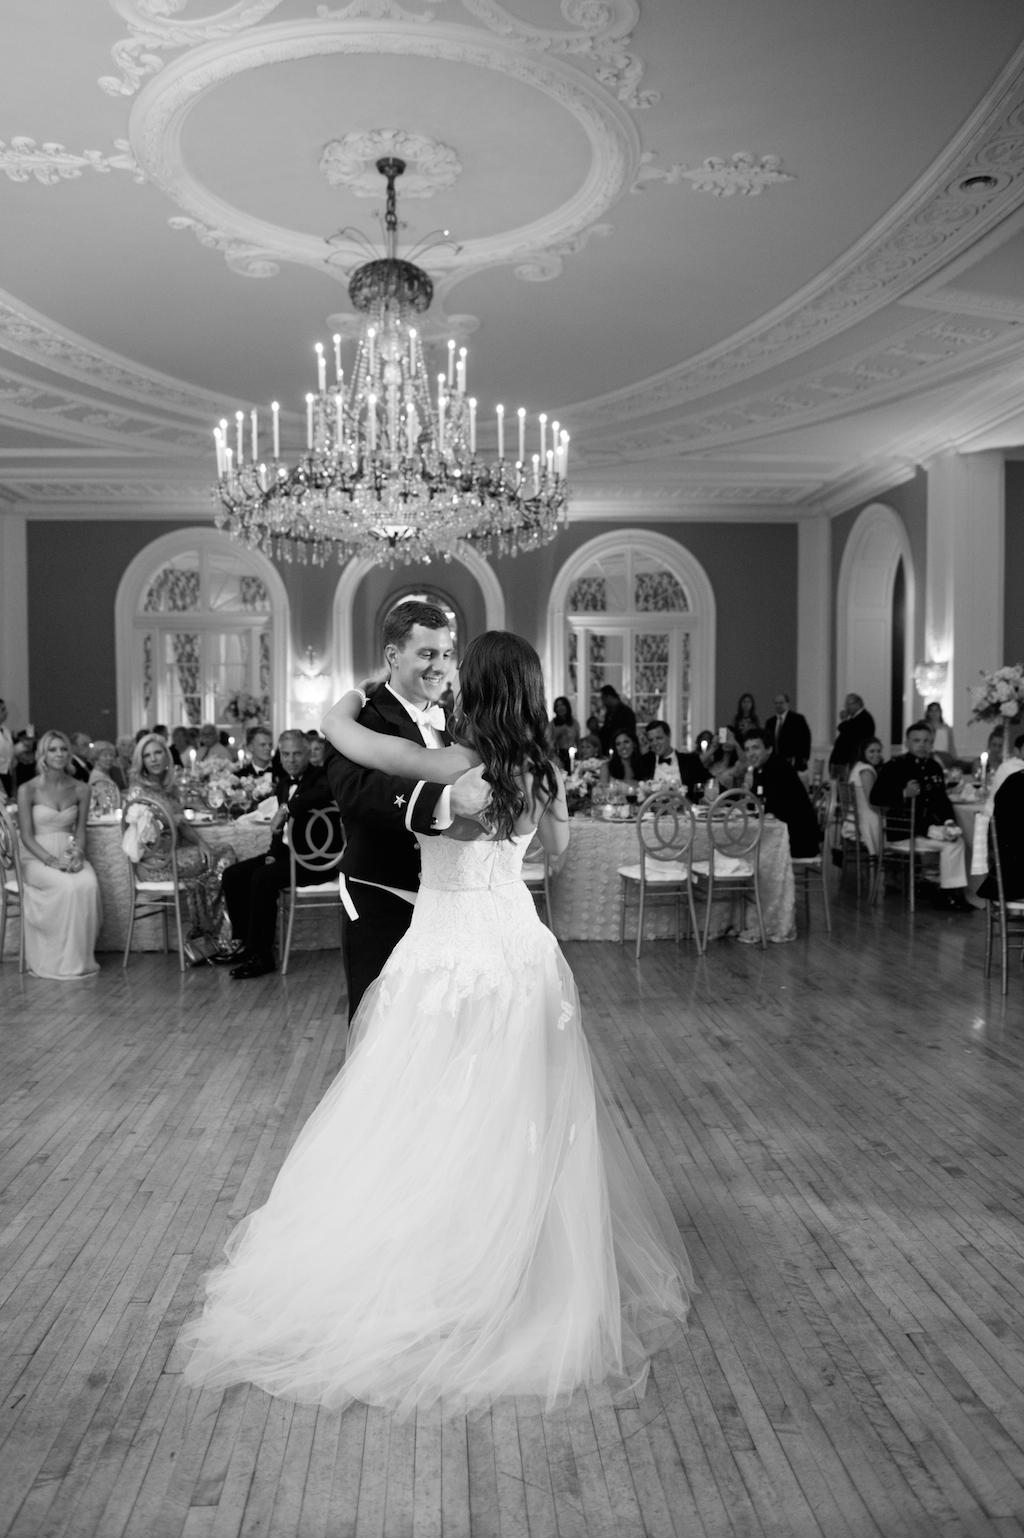 3-3-16-classy-wedding-at-west-virginia-greenbrier-23